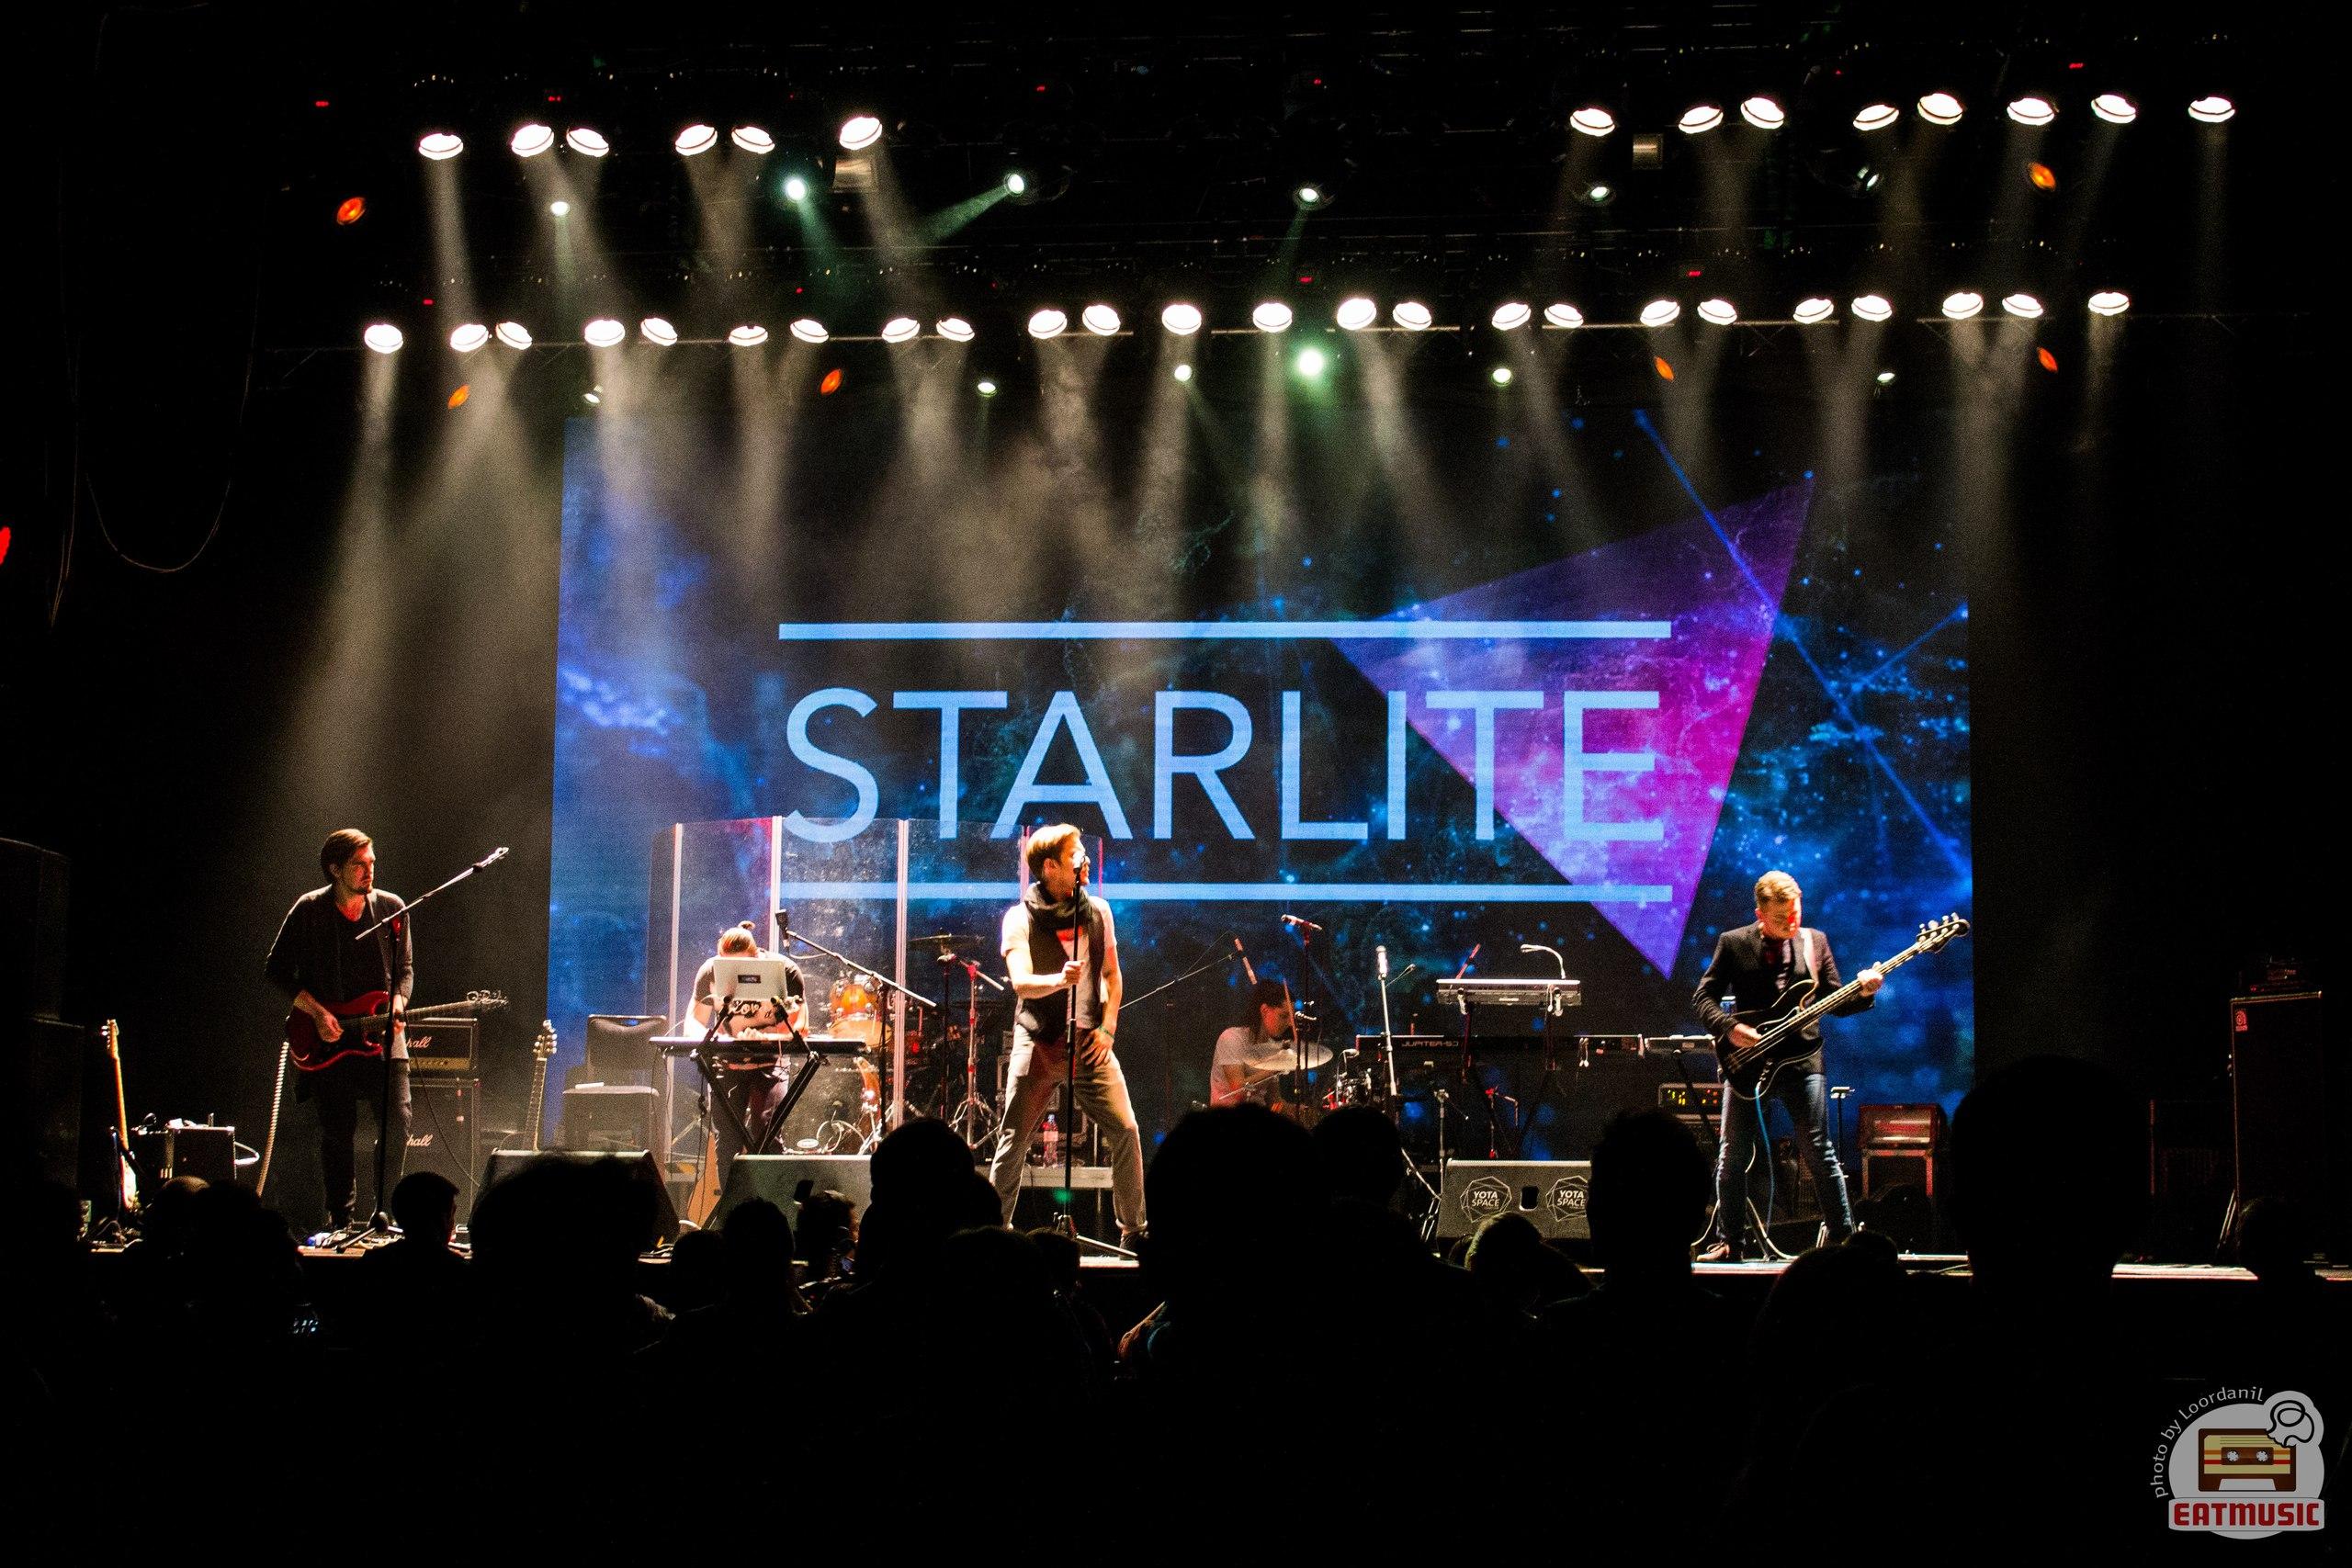 Концерт группы BOSAYA Starlite